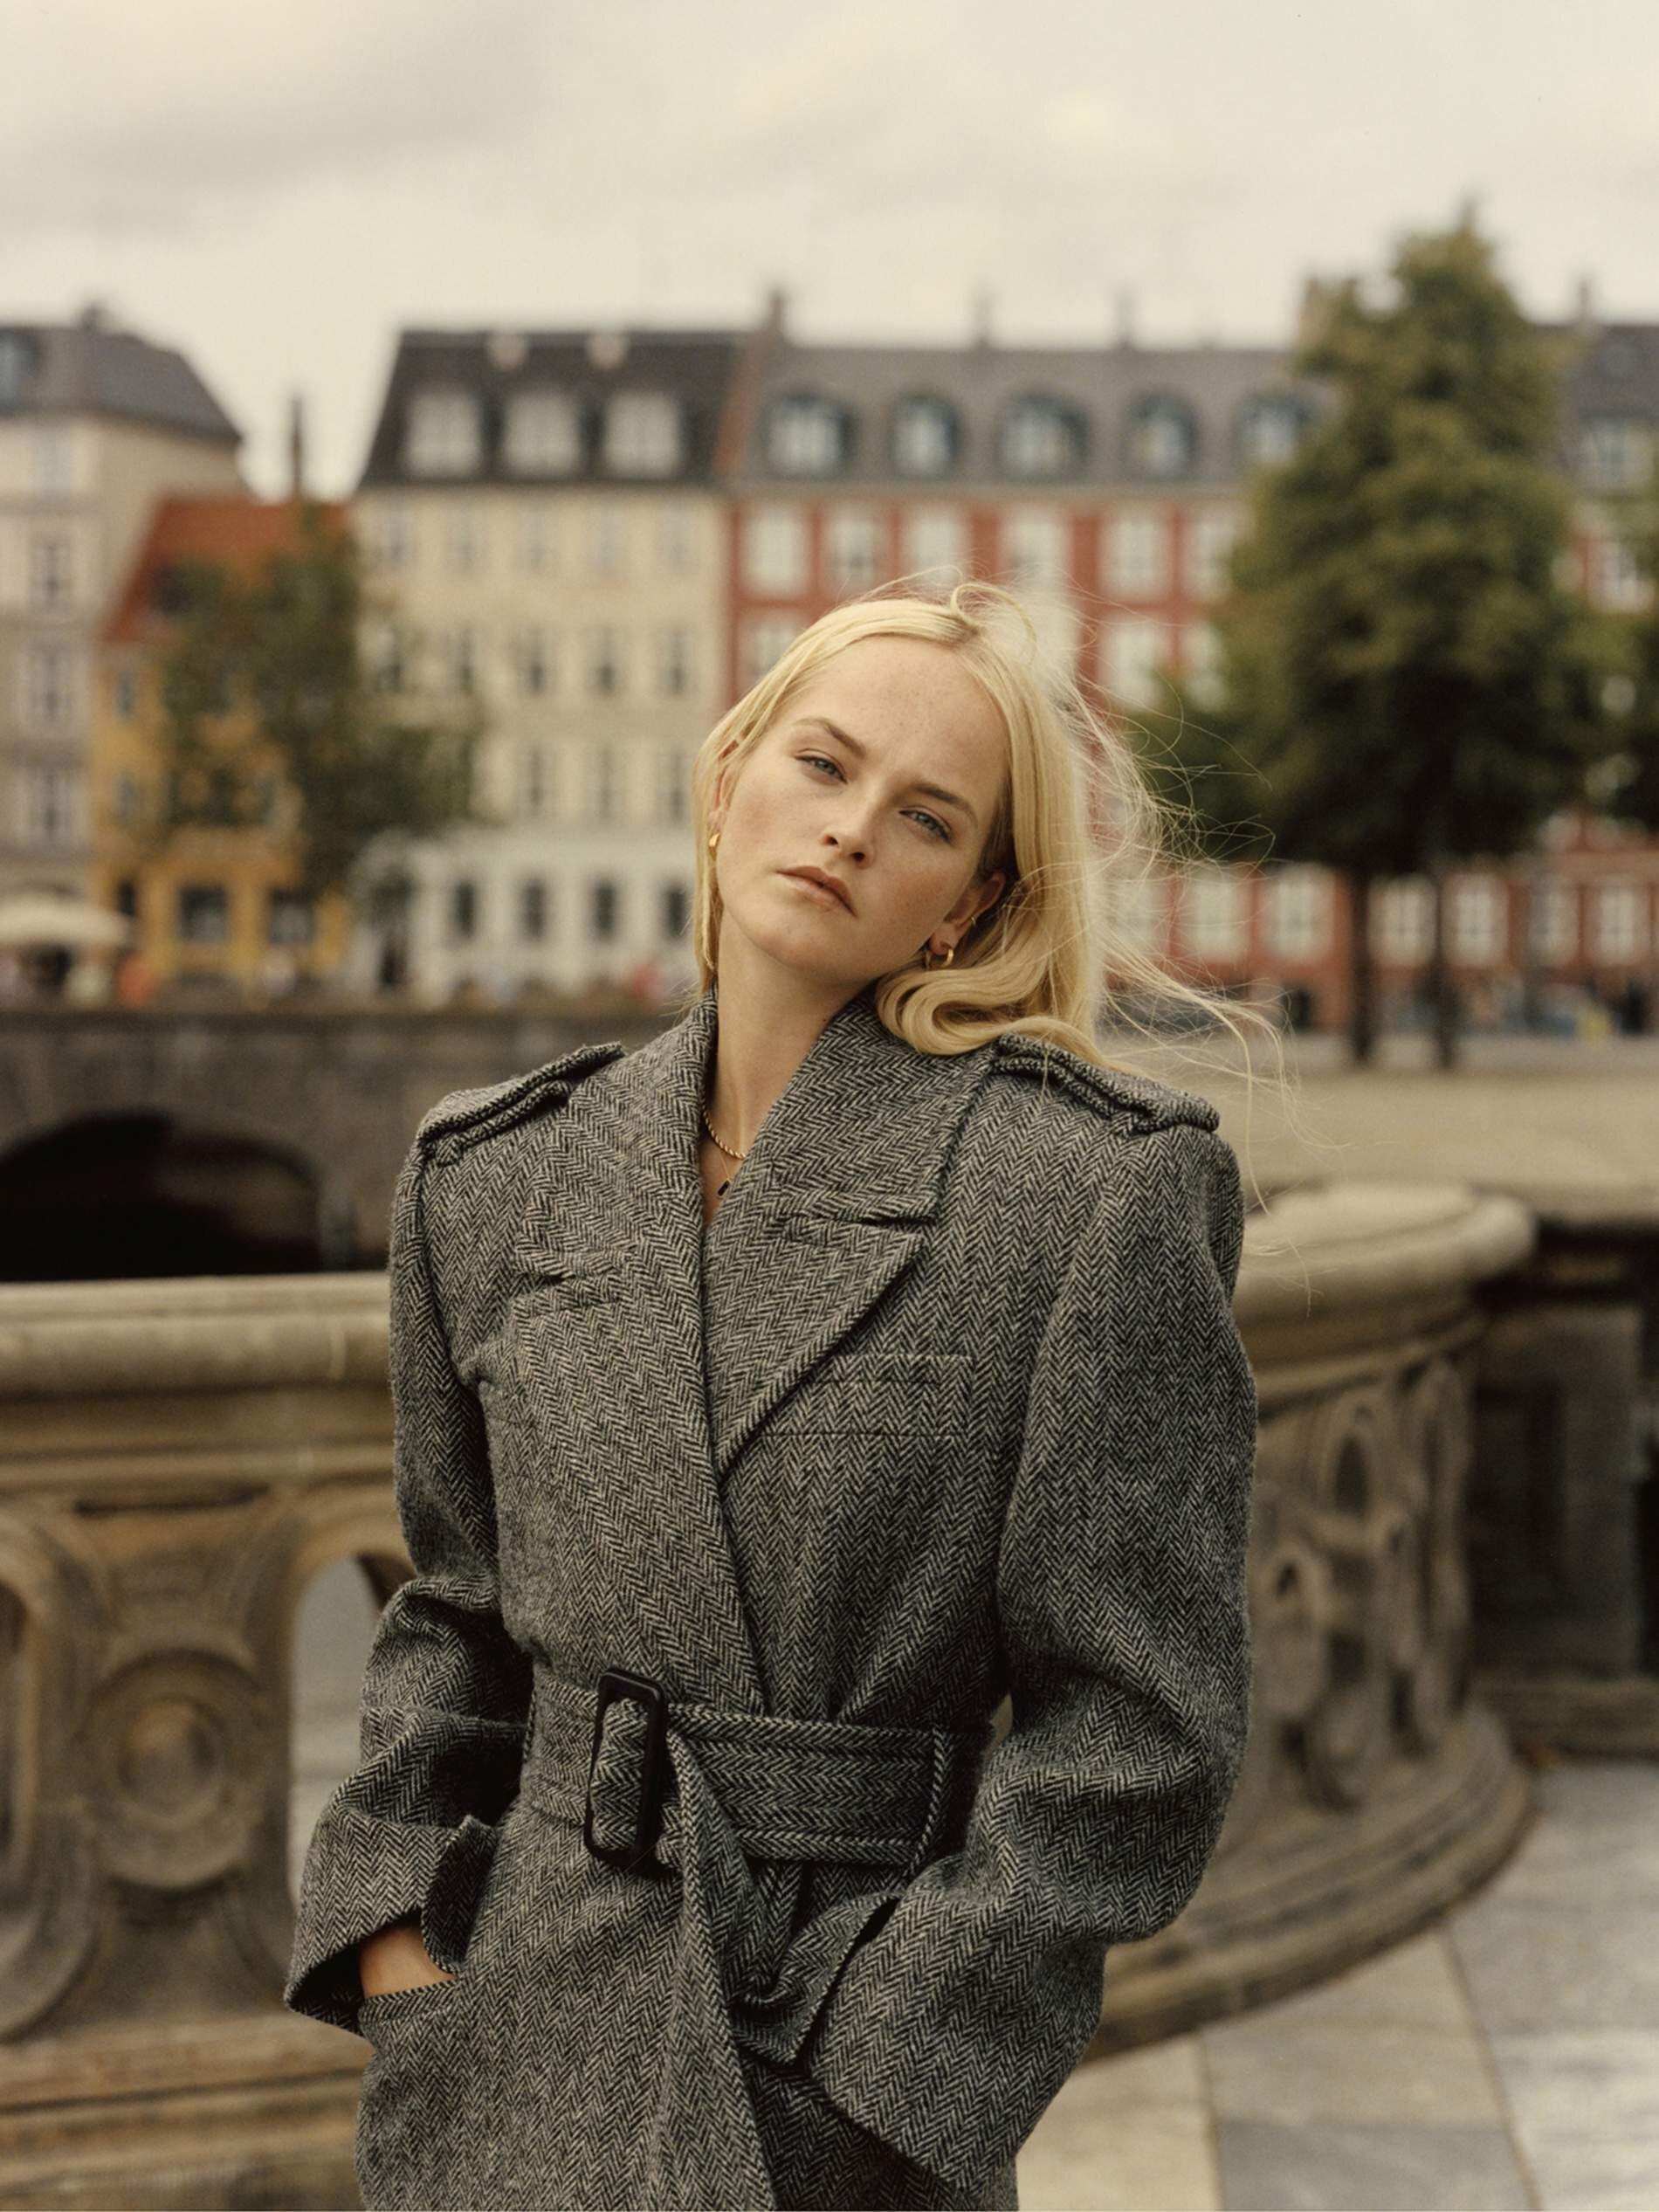 Image Jean Campbell by Quentin De Briey for Porter Edit. Coat, Saint Laurent; earrings, Sophie Buhai; necklace, Laura Lombardi